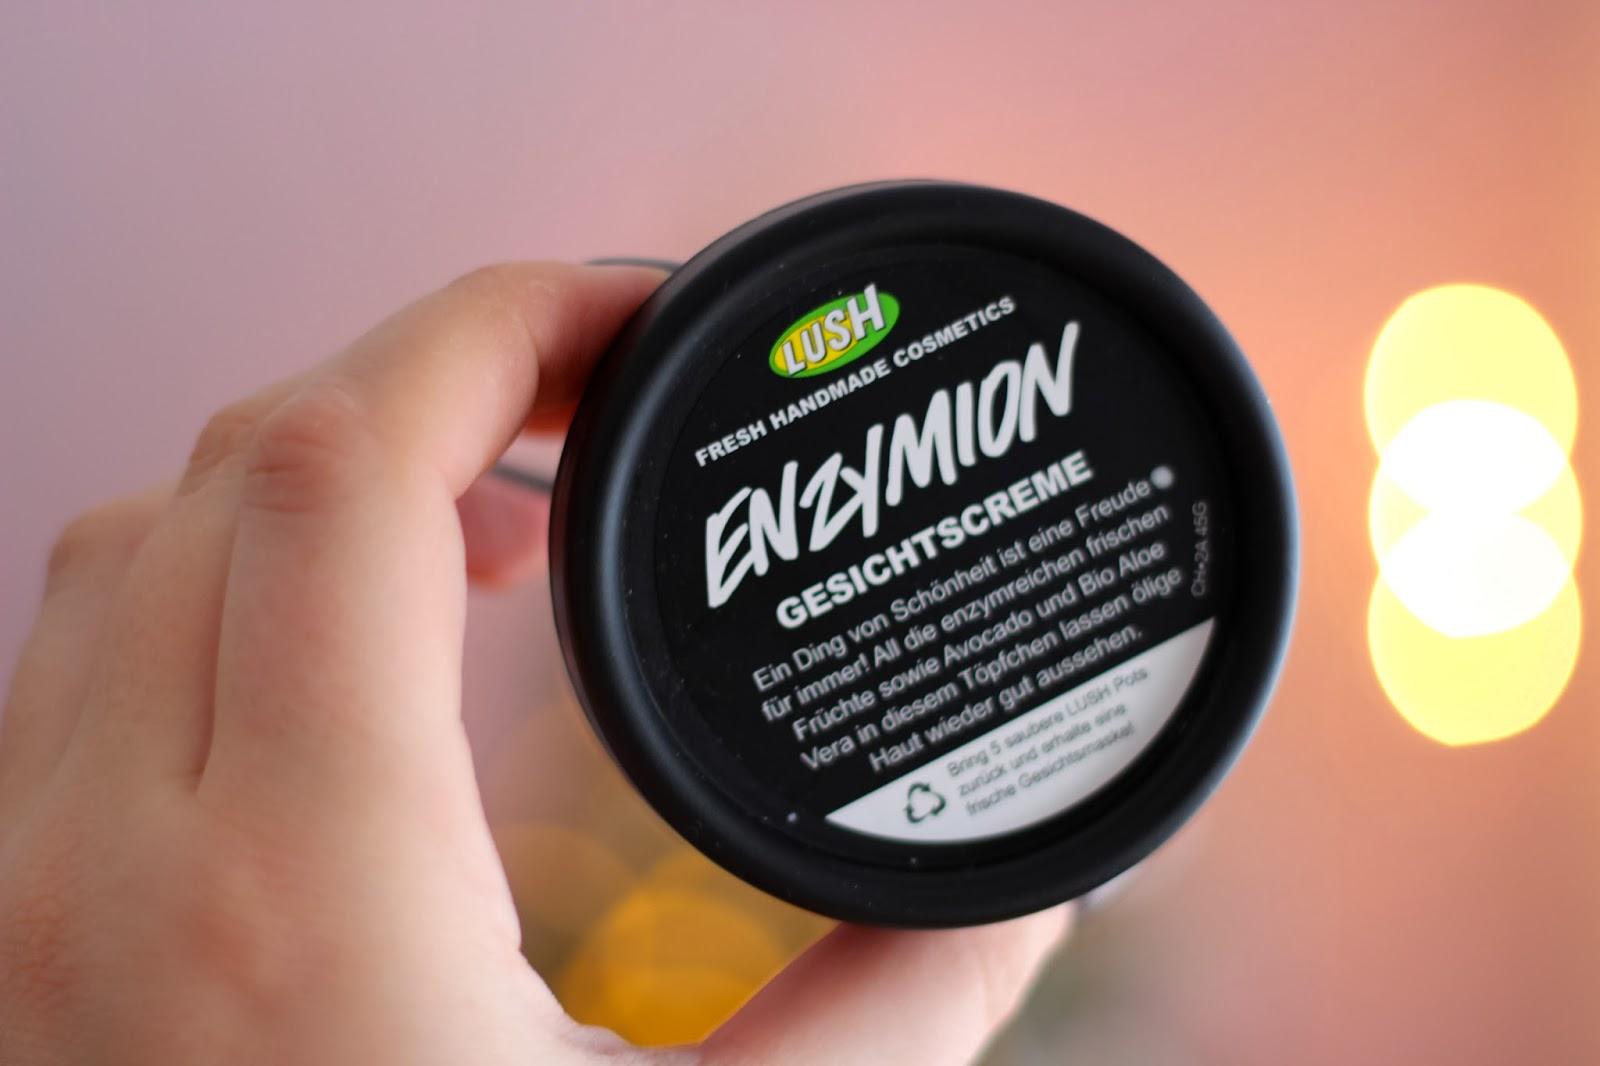 skincare-haul-lush-cosmetics-5